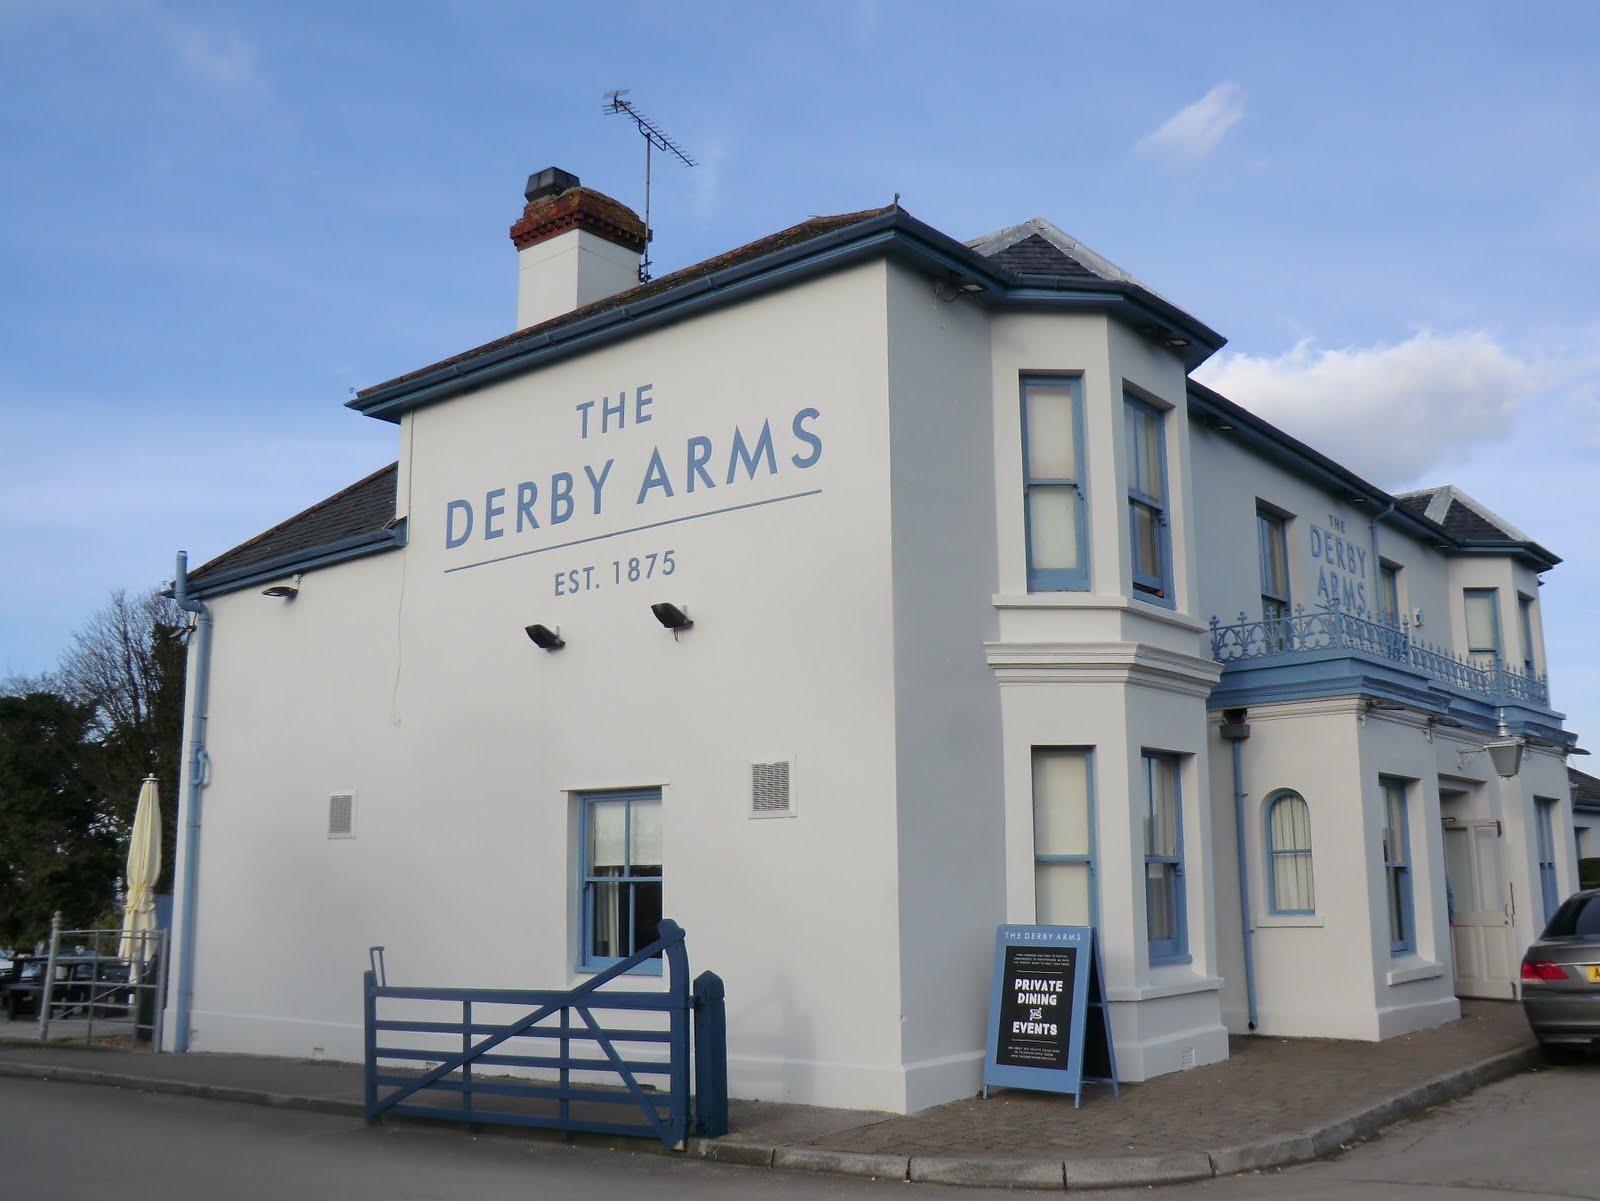 CIMG3692 The Derby Arms pub, Epsom Downs